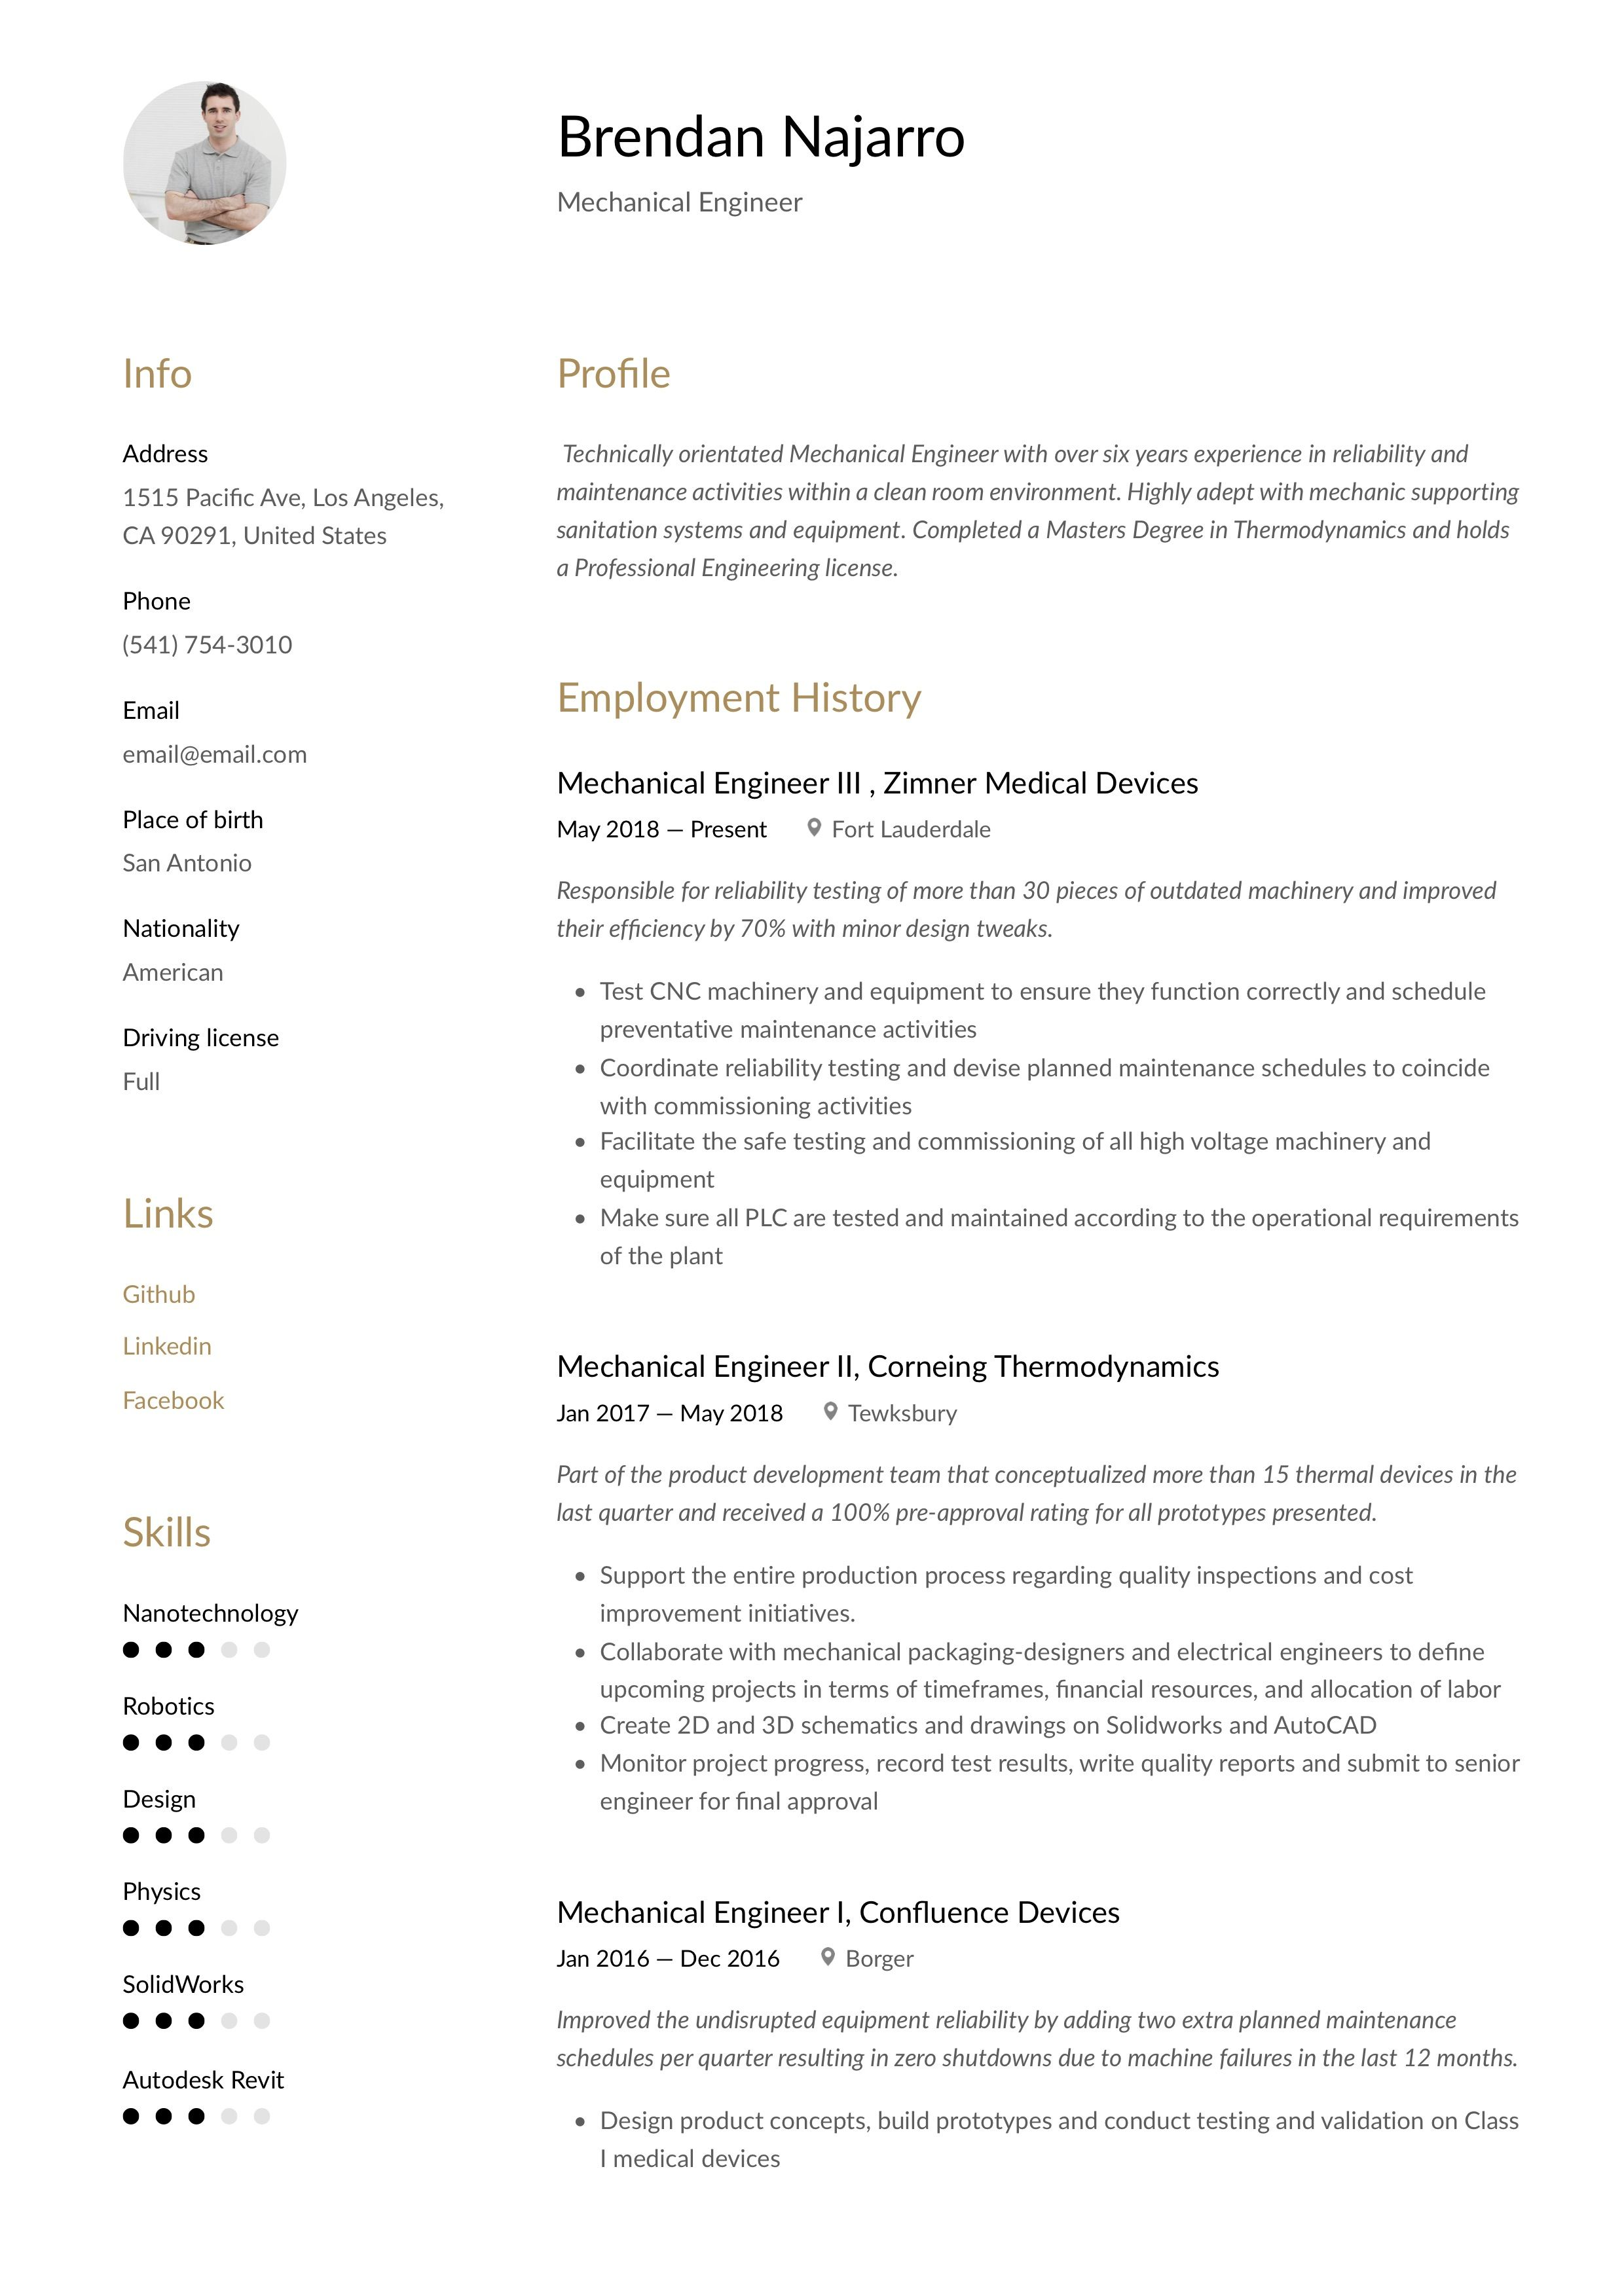 Modern Mechanical Engineer Resume, template, design, tips